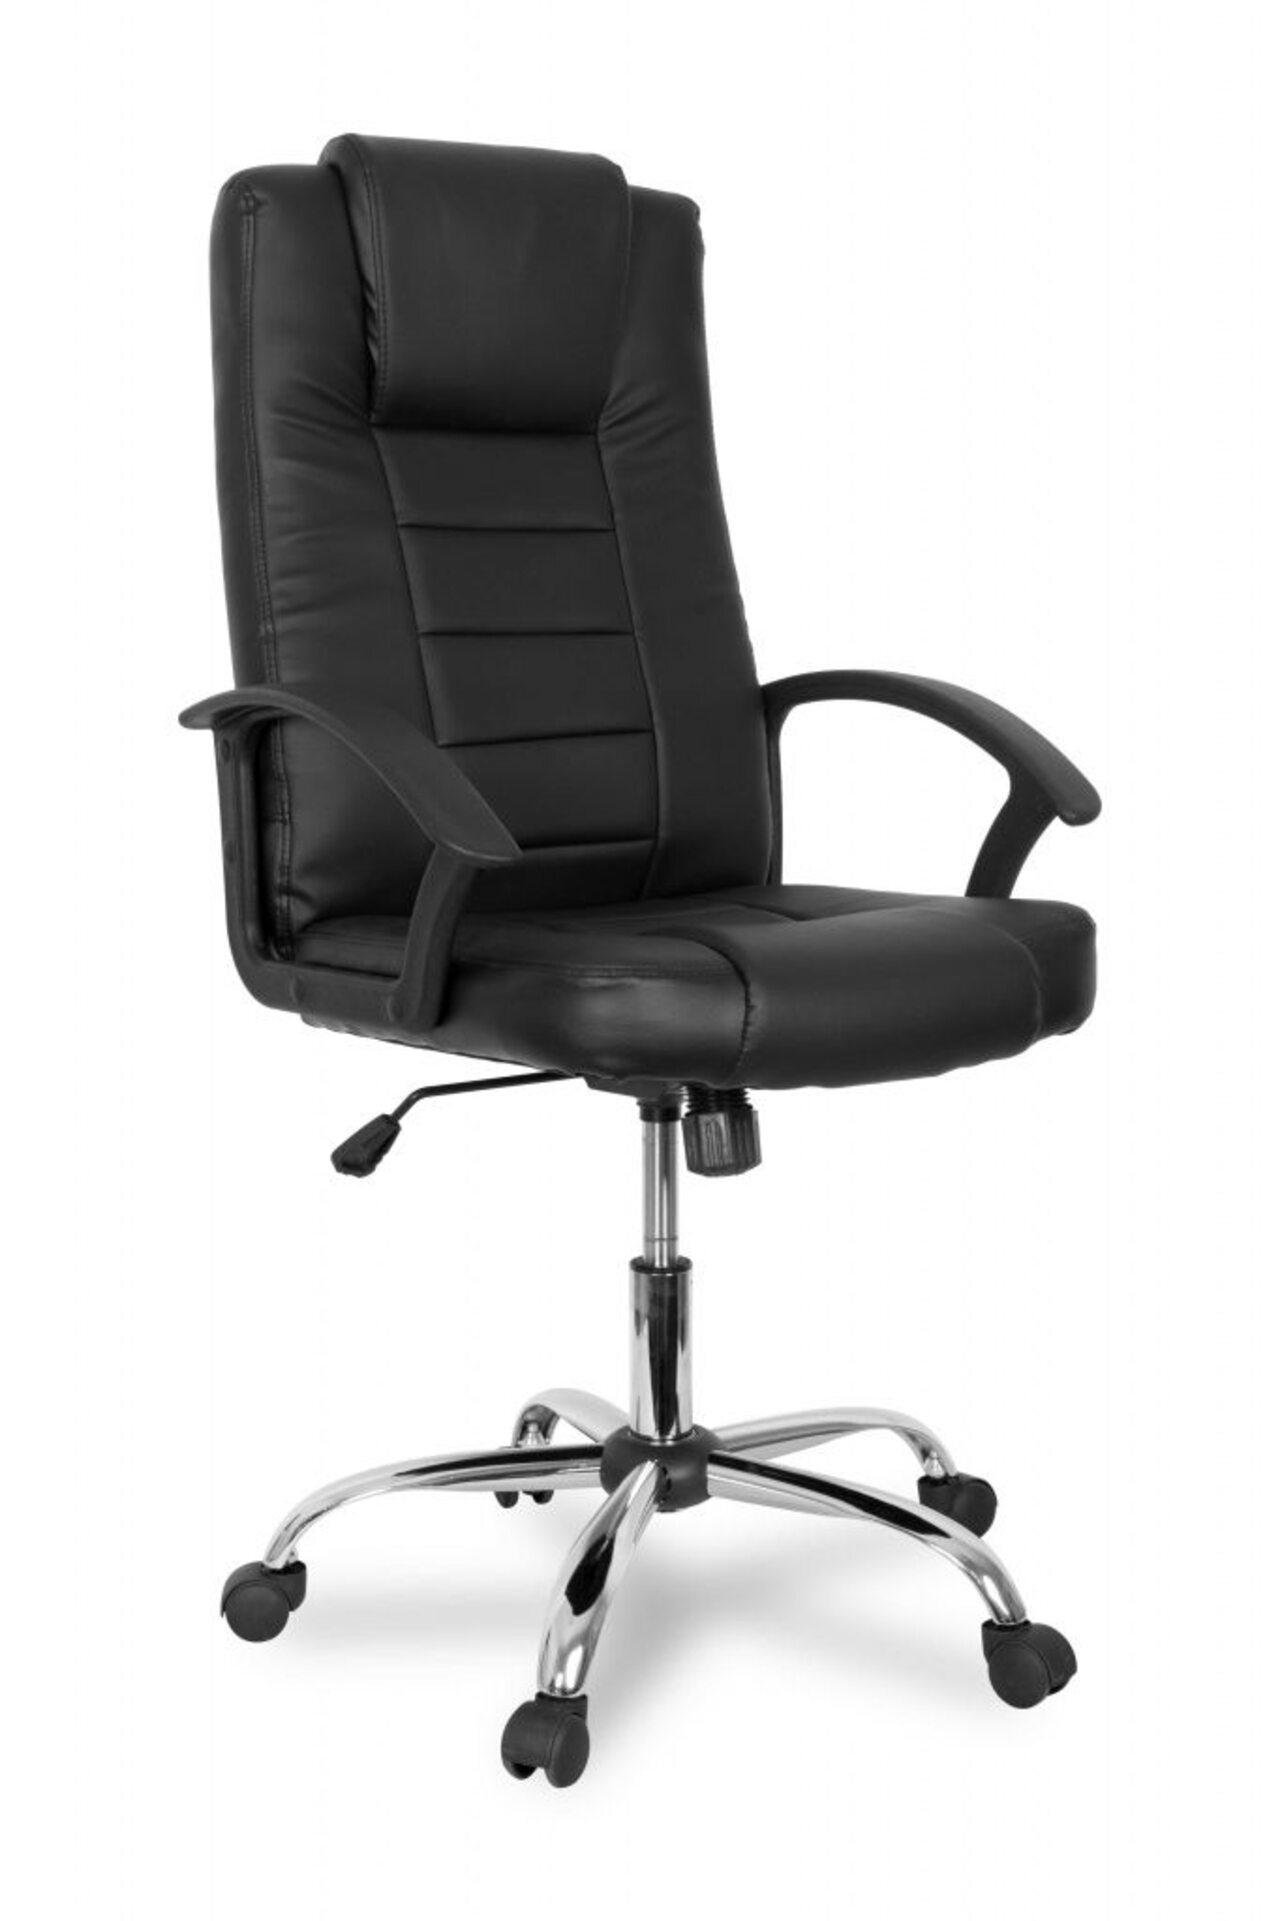 Кресло руководителя College BX-3375 - фото 1